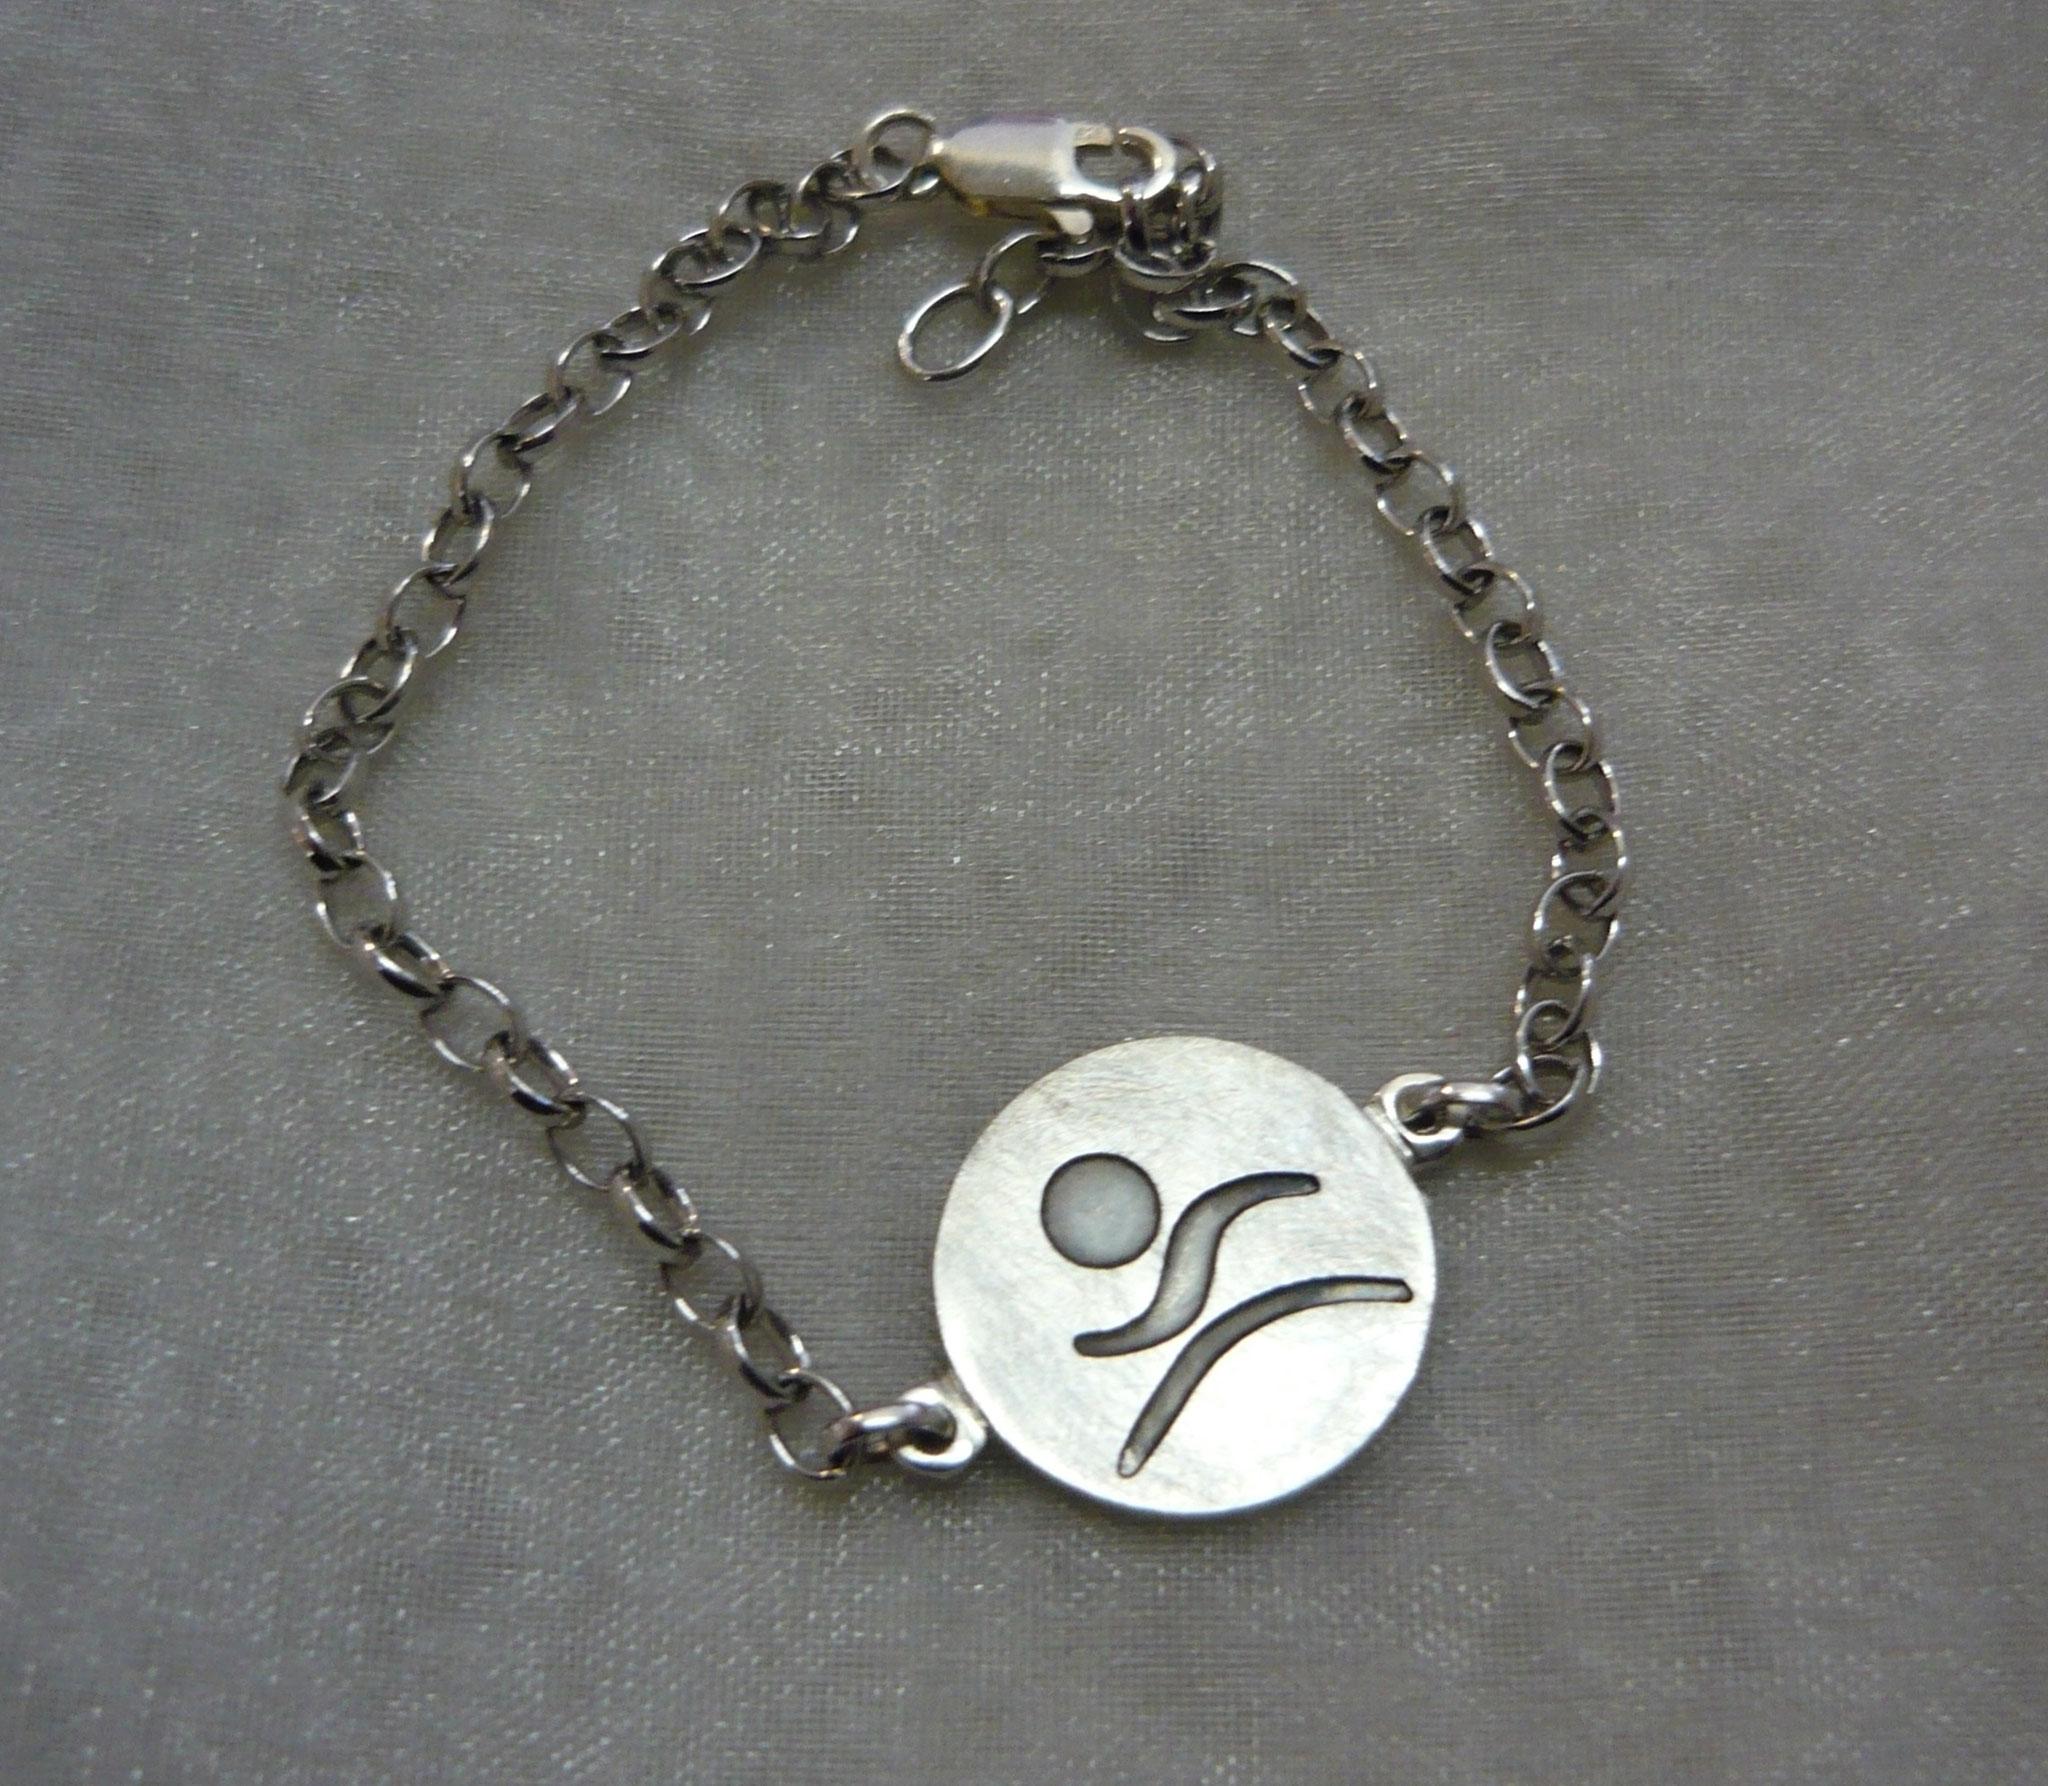 Florianer-Armband 925/000 Sterling-Silber € 85,-